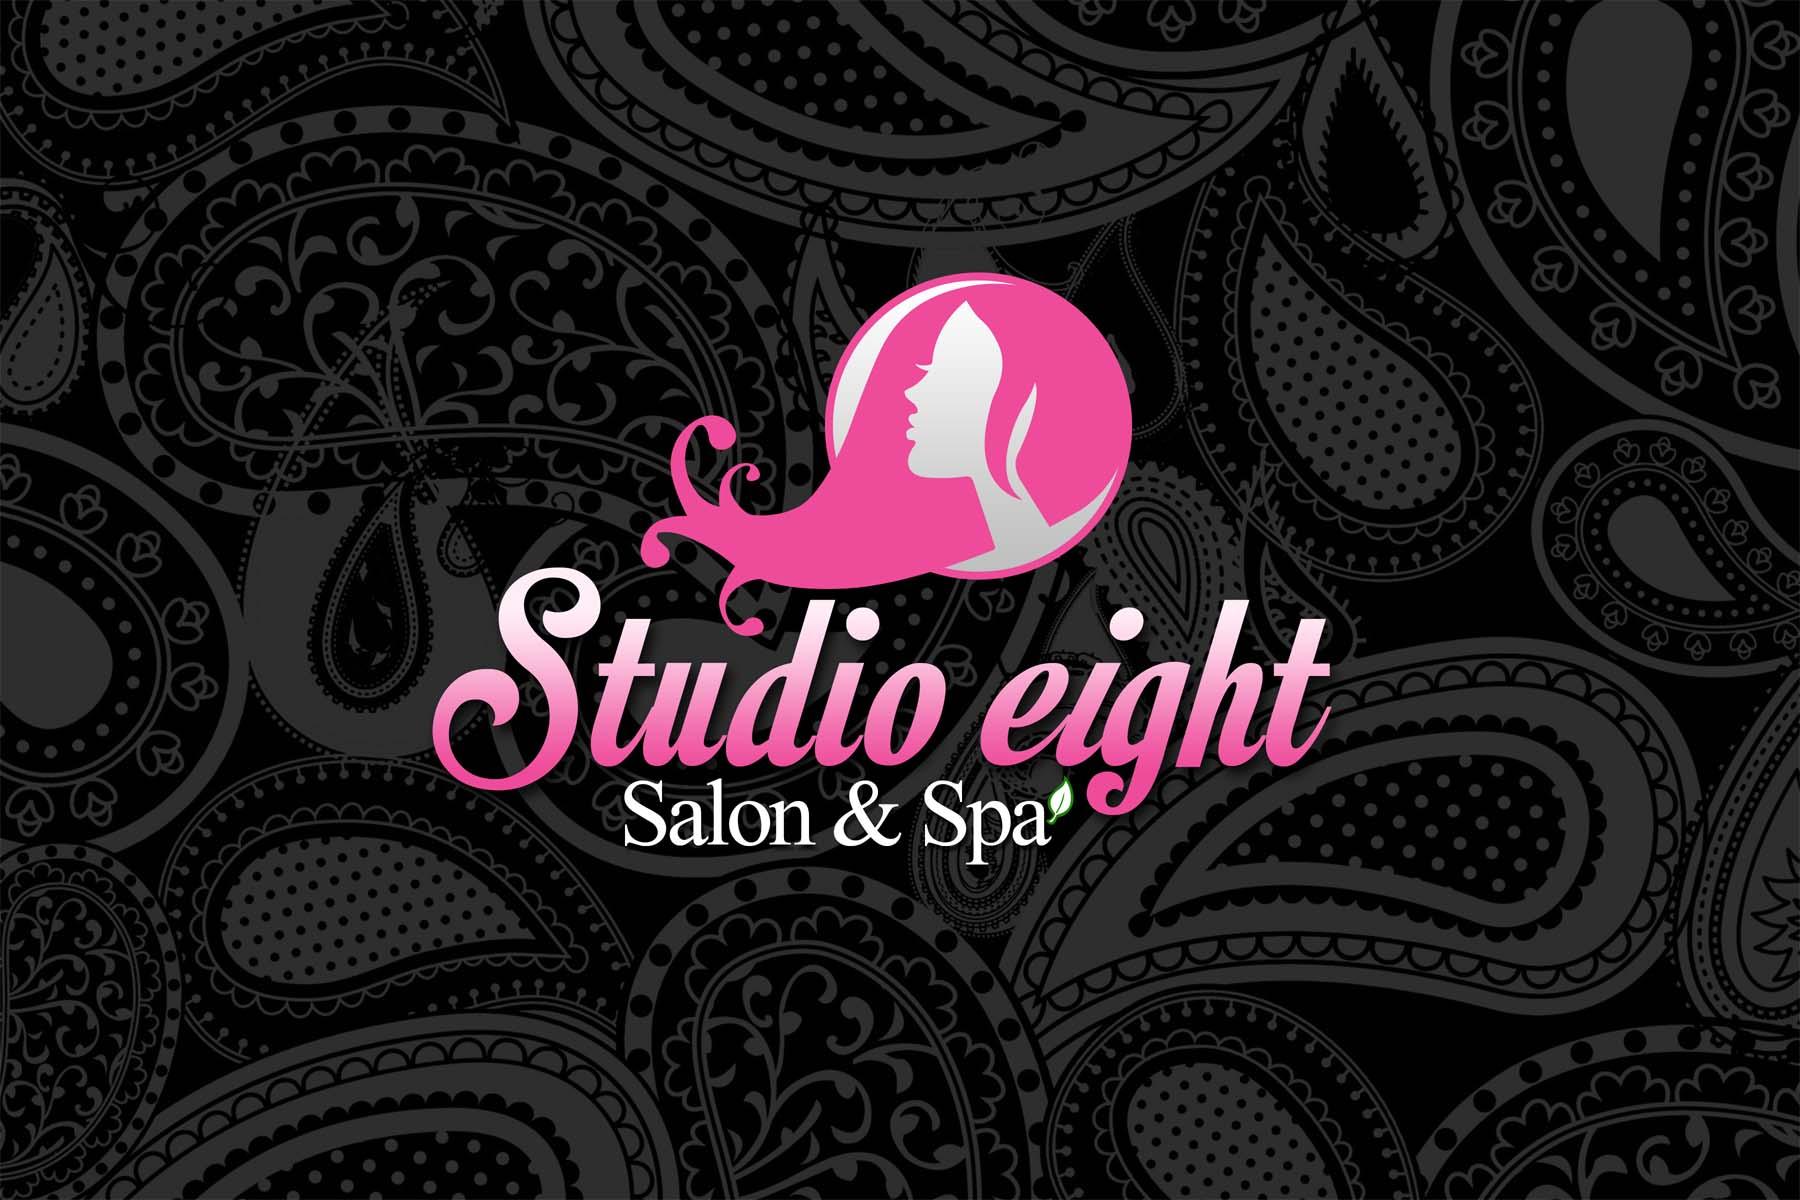 Logo Design by Private User - Entry No. 98 in the Logo Design Contest Captivating Logo Design for studio eight salon & spa.